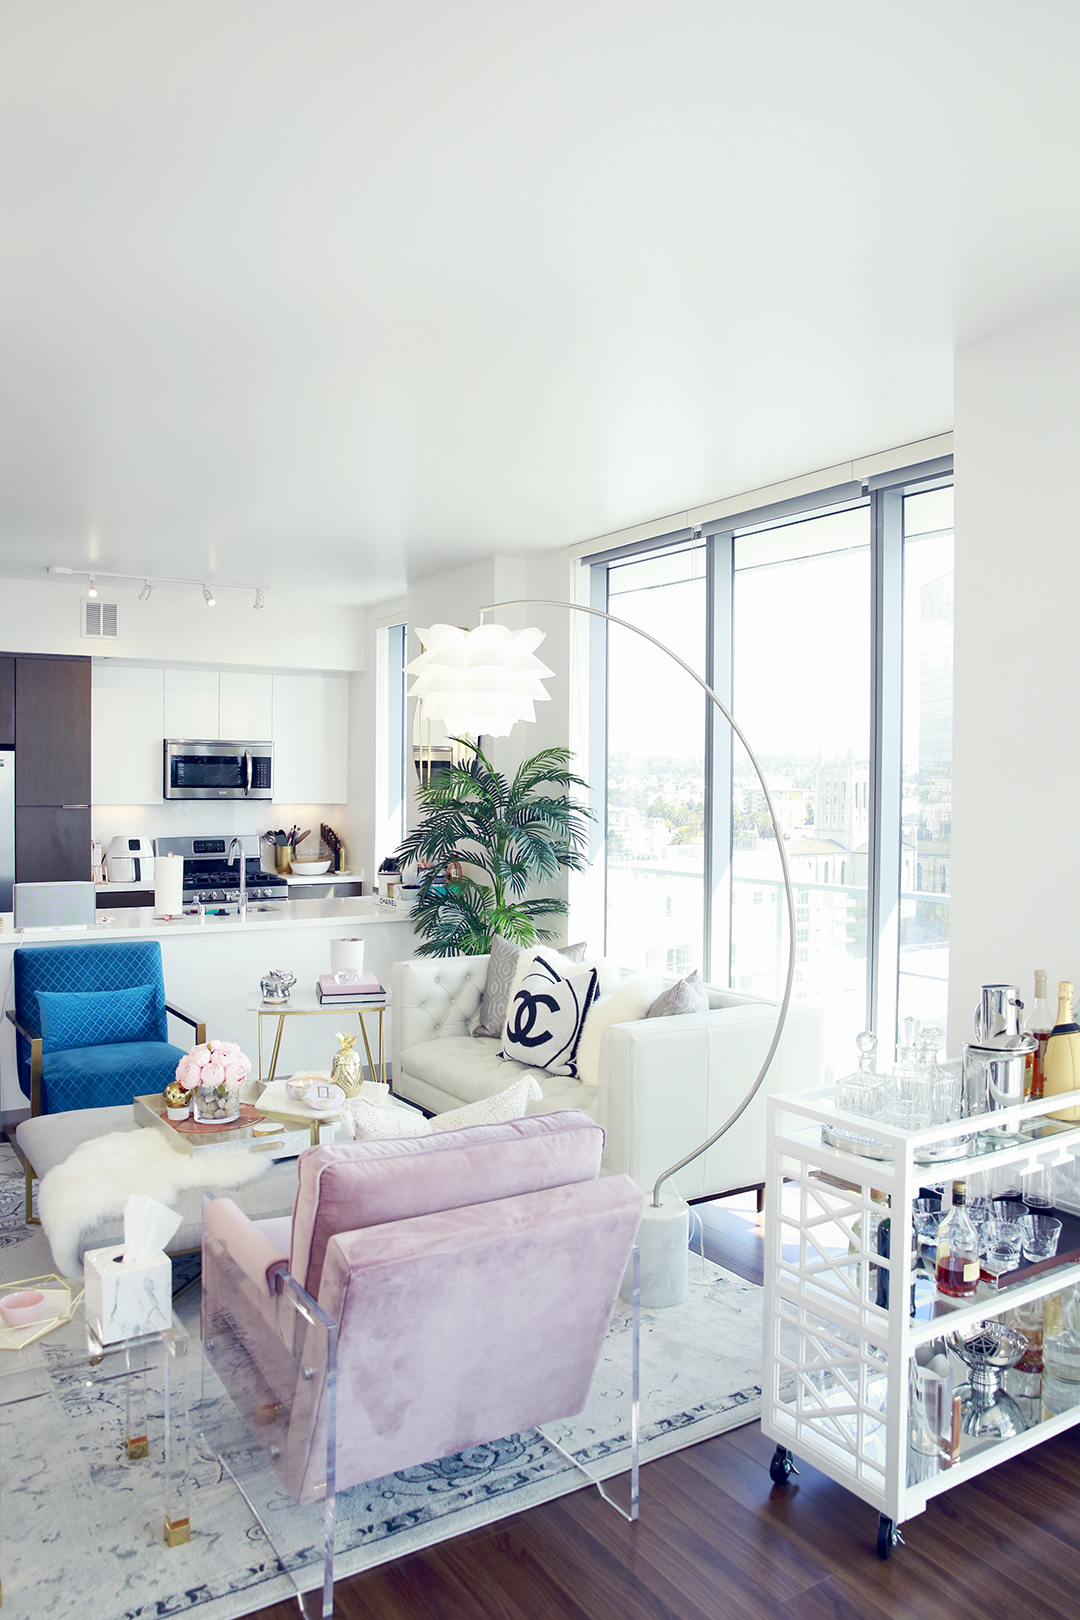 Hautepinkpretty Apartment Lighting With Lamps Plus